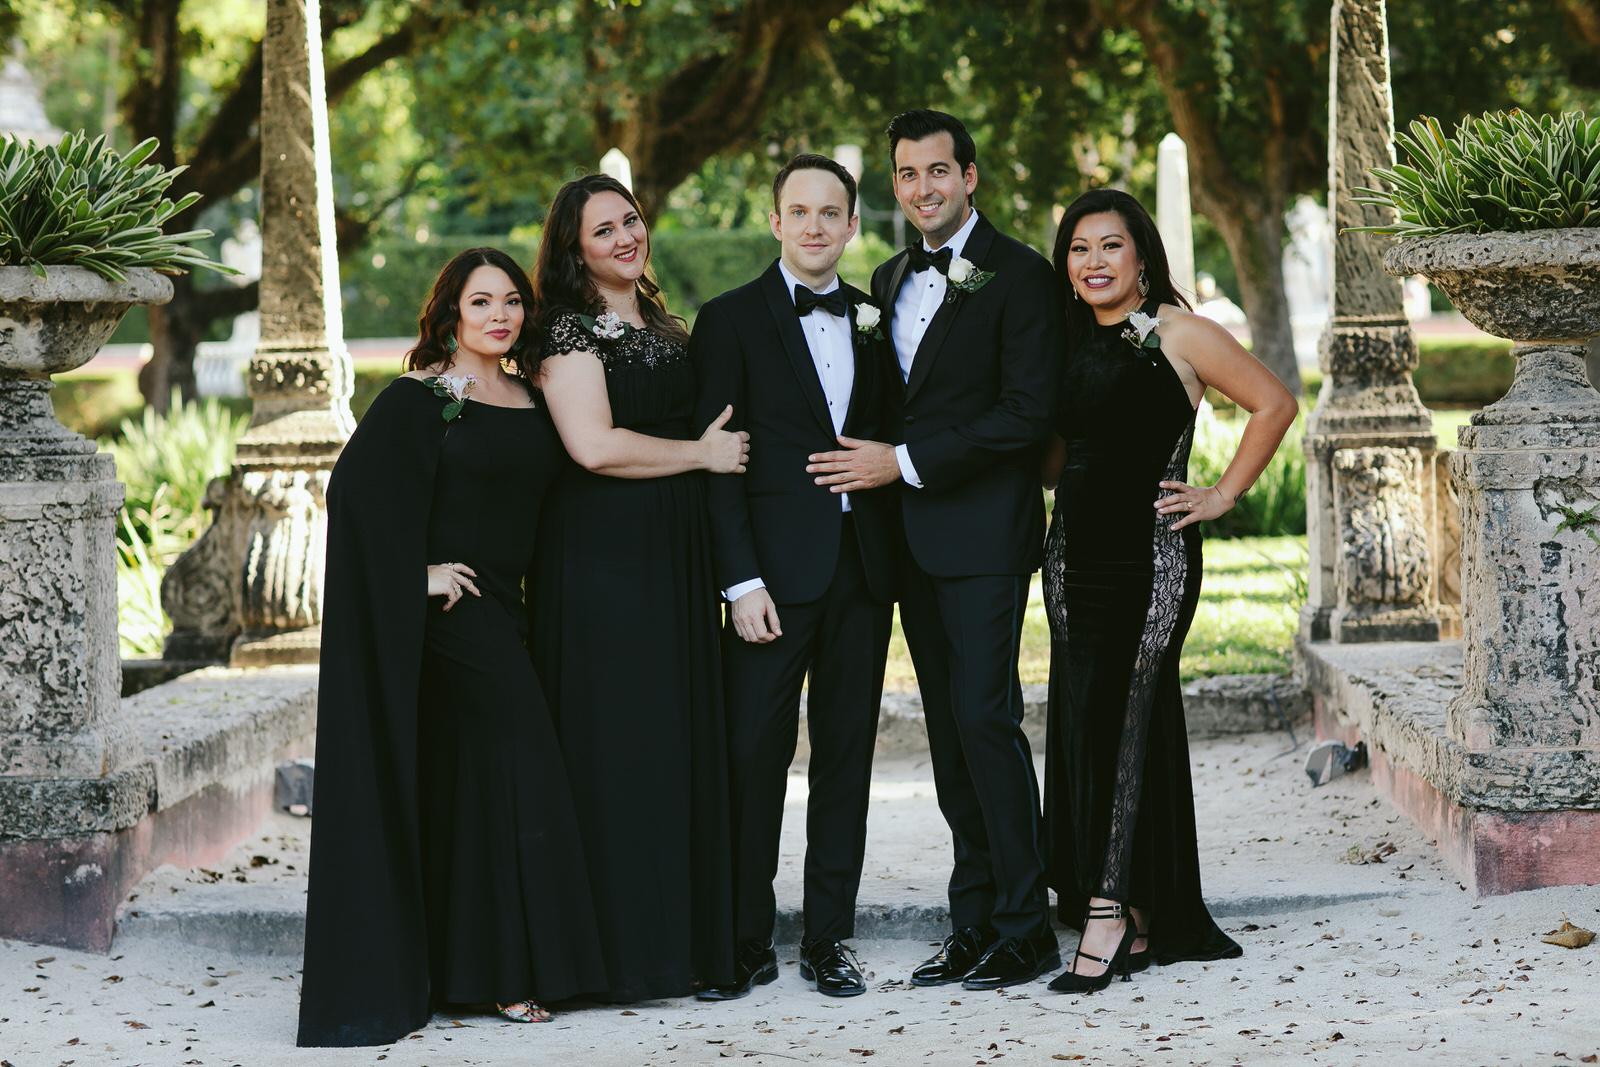 vizcaya_elopement_intimate_wedding_family_formals-70.jpg